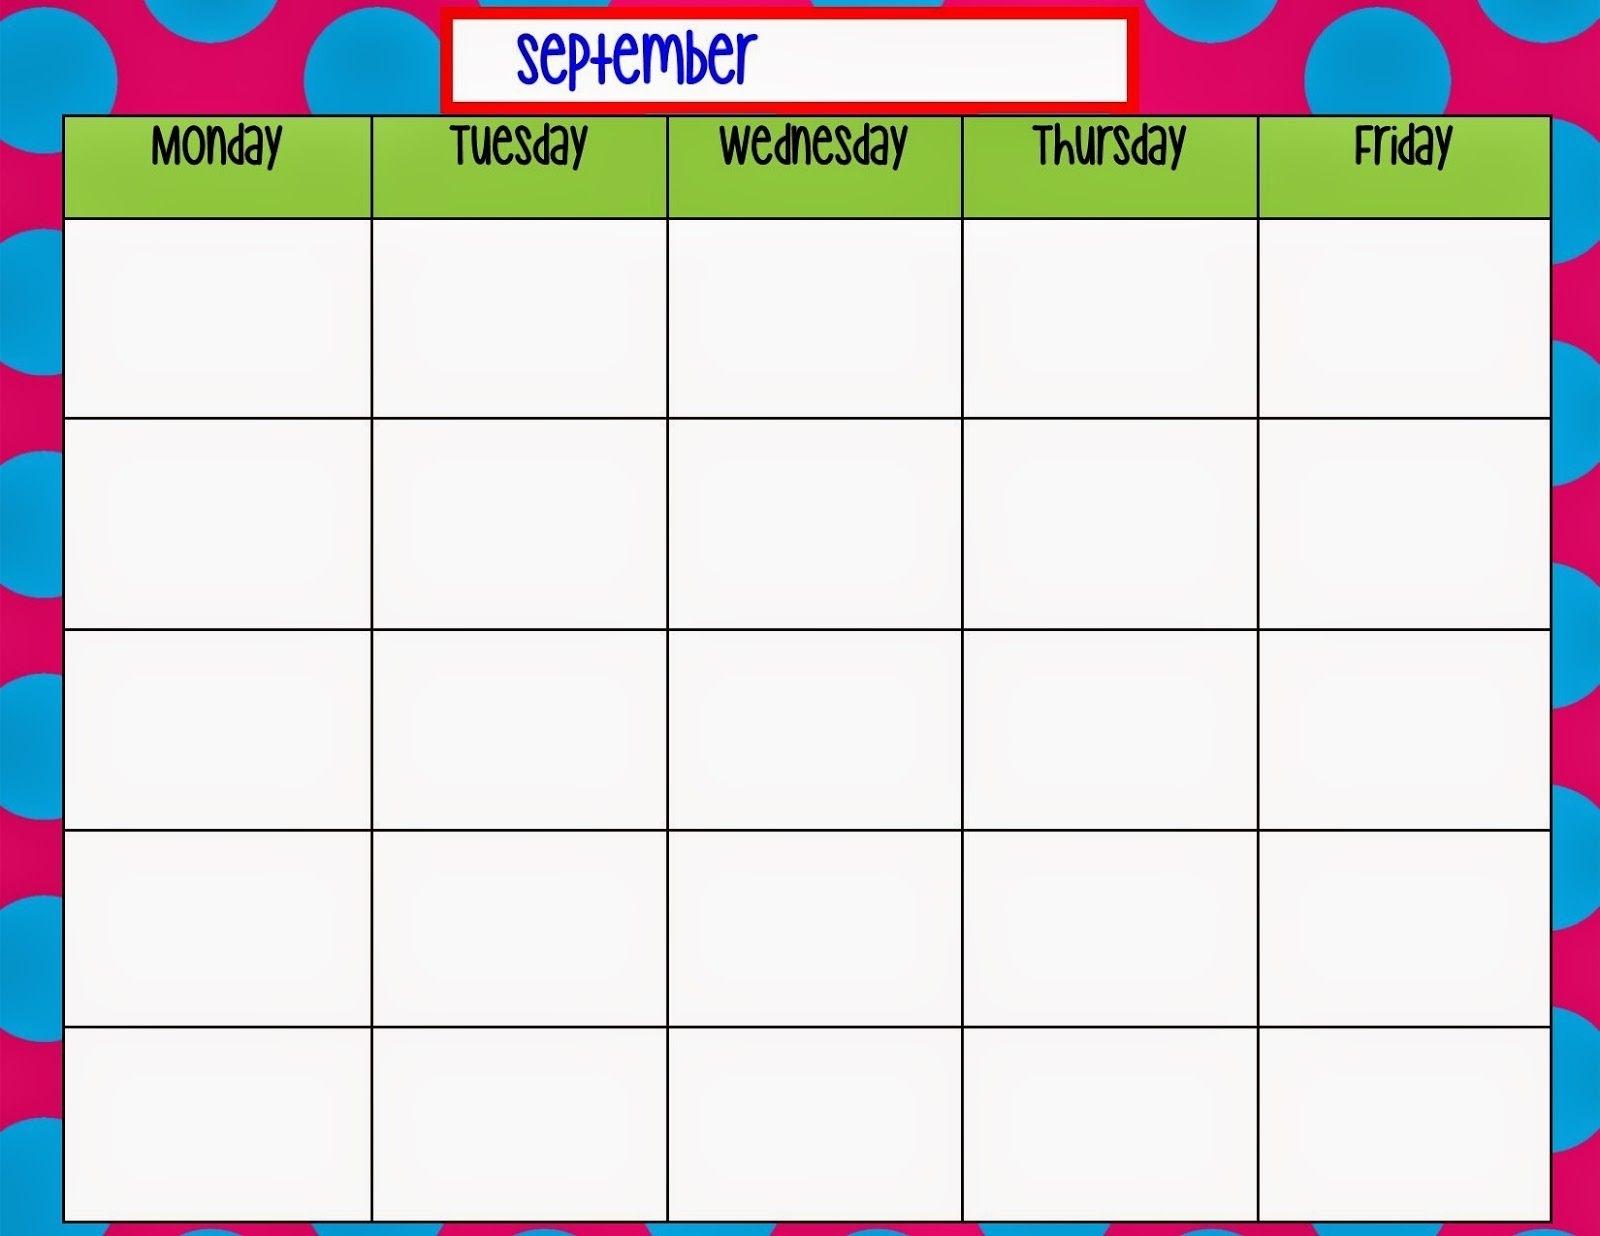 Monday Through Friday Calendar Template   Preschool   Printable intended for Printable Sunday Thru Saturday To Do List Calendar